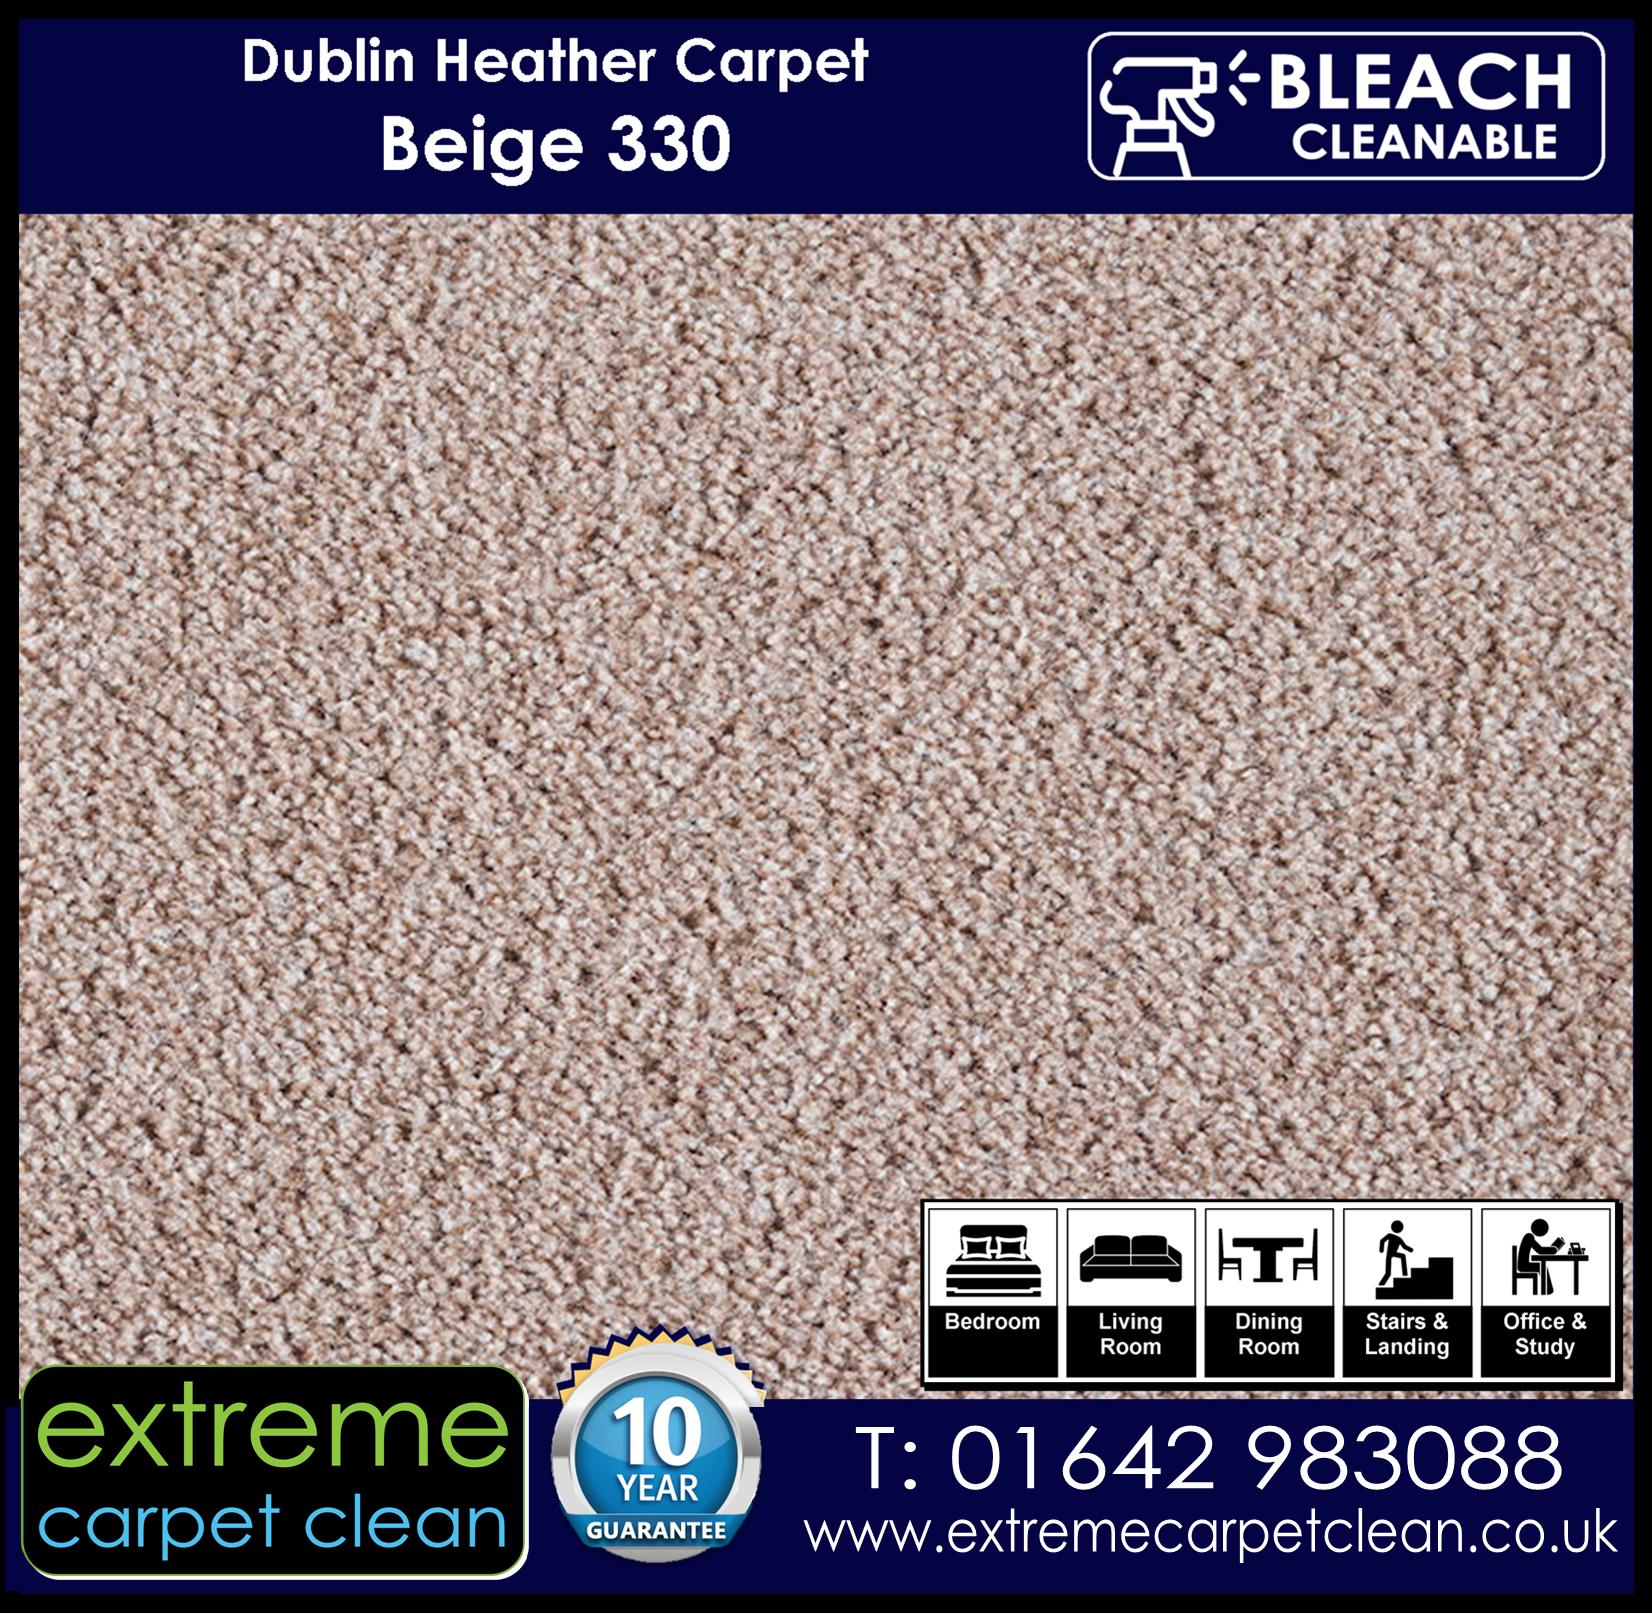 Dublin Heather Carpet Range. Beige 330 Extreme Carpet Clean